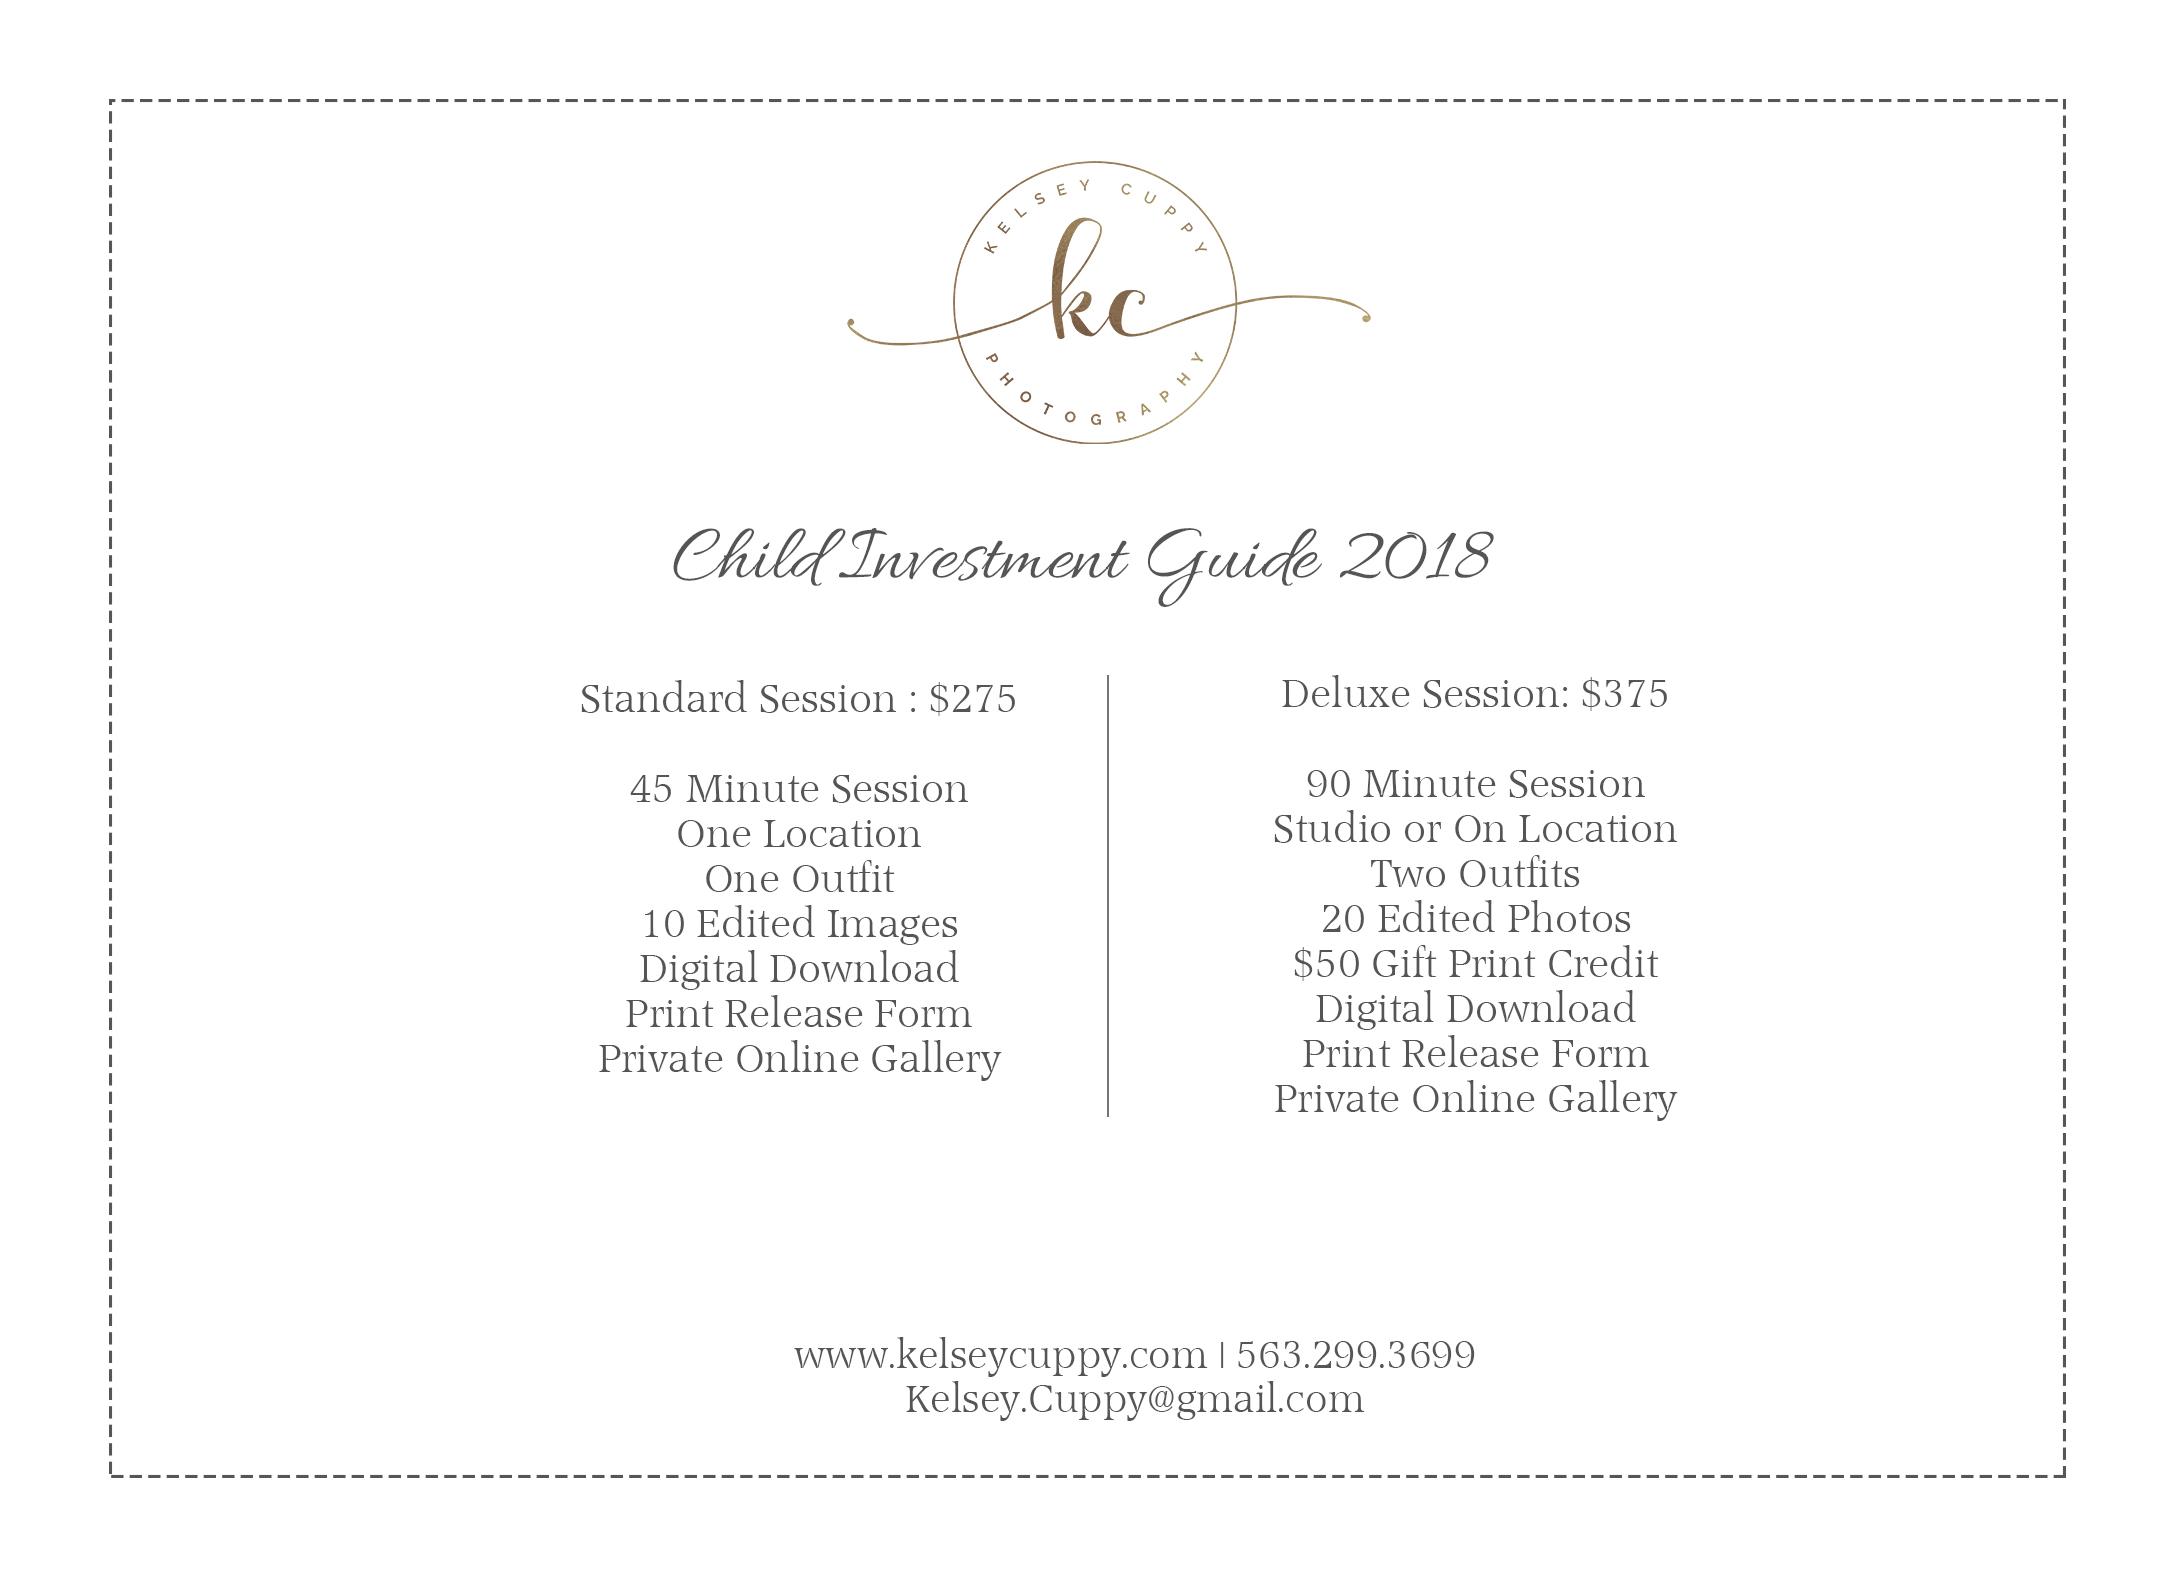 childinvestment2018.jpg